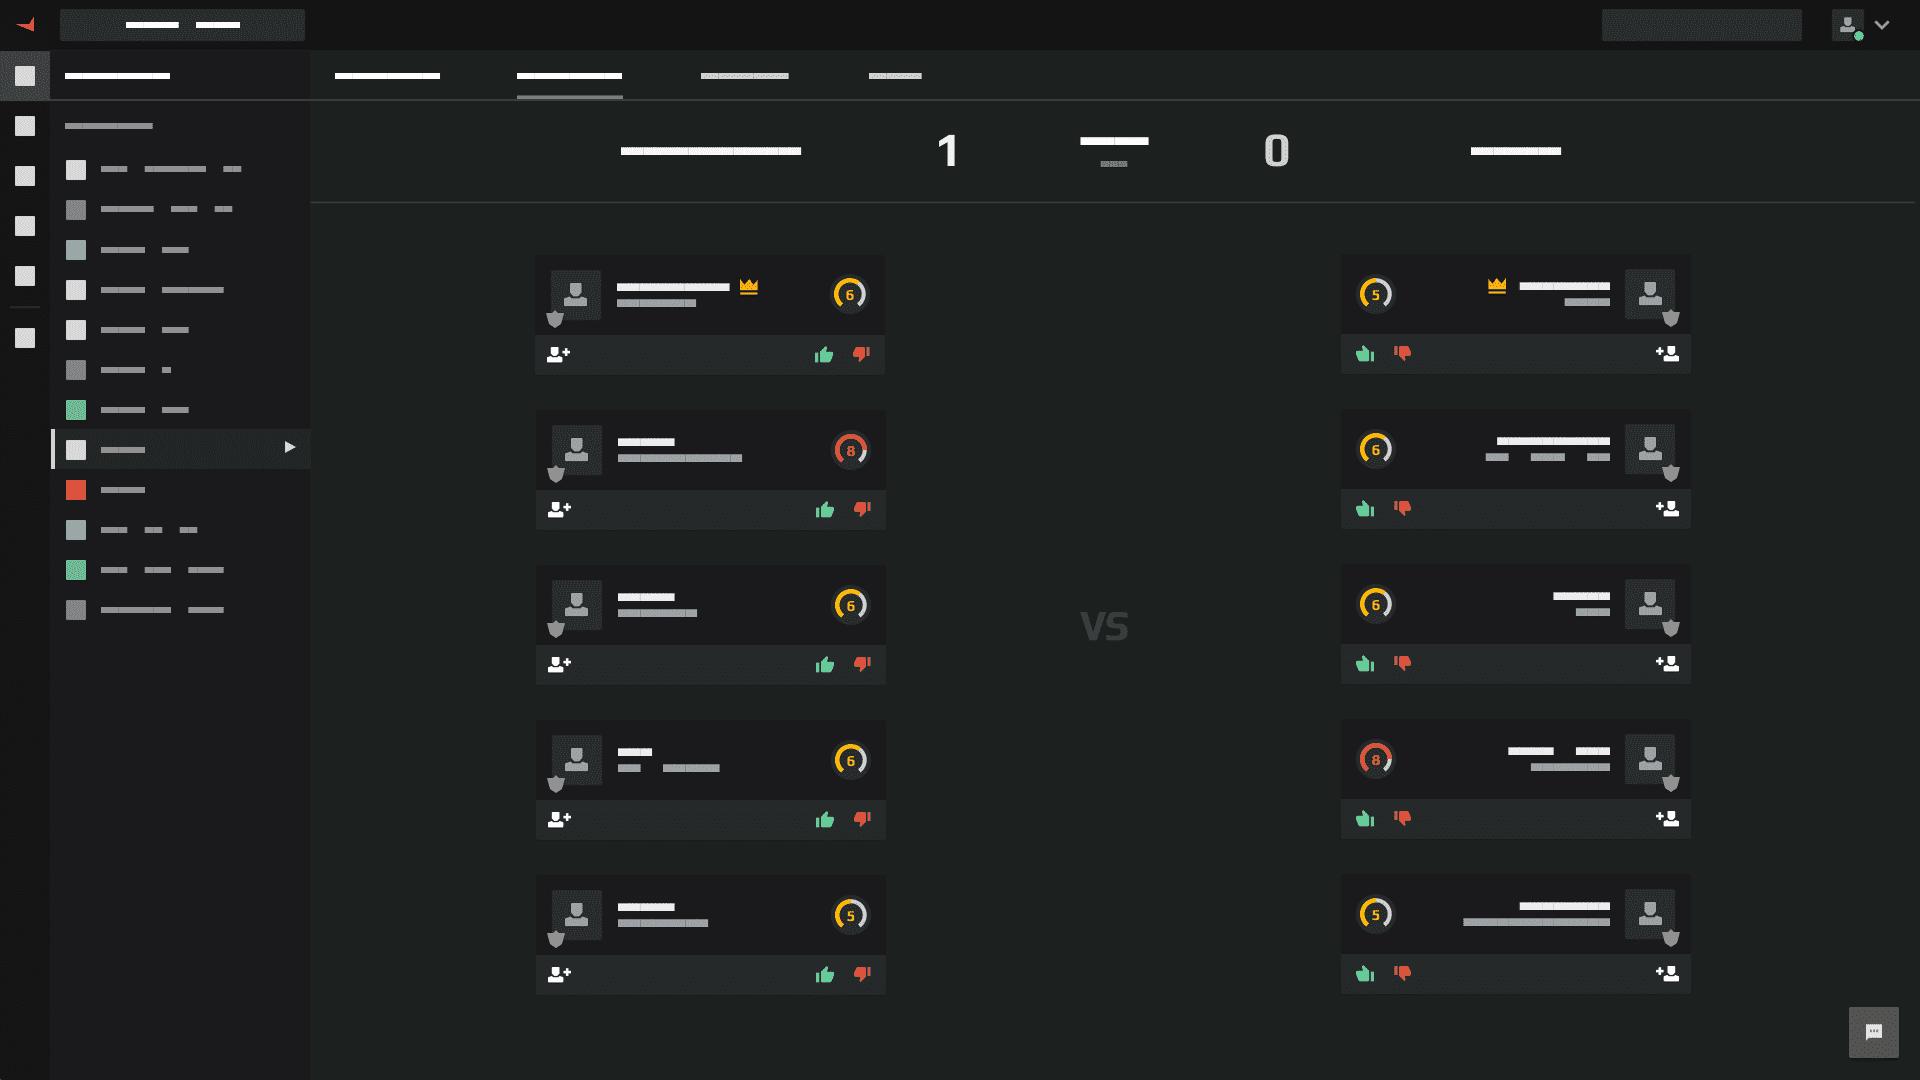 Lol statystyki matchmakingu